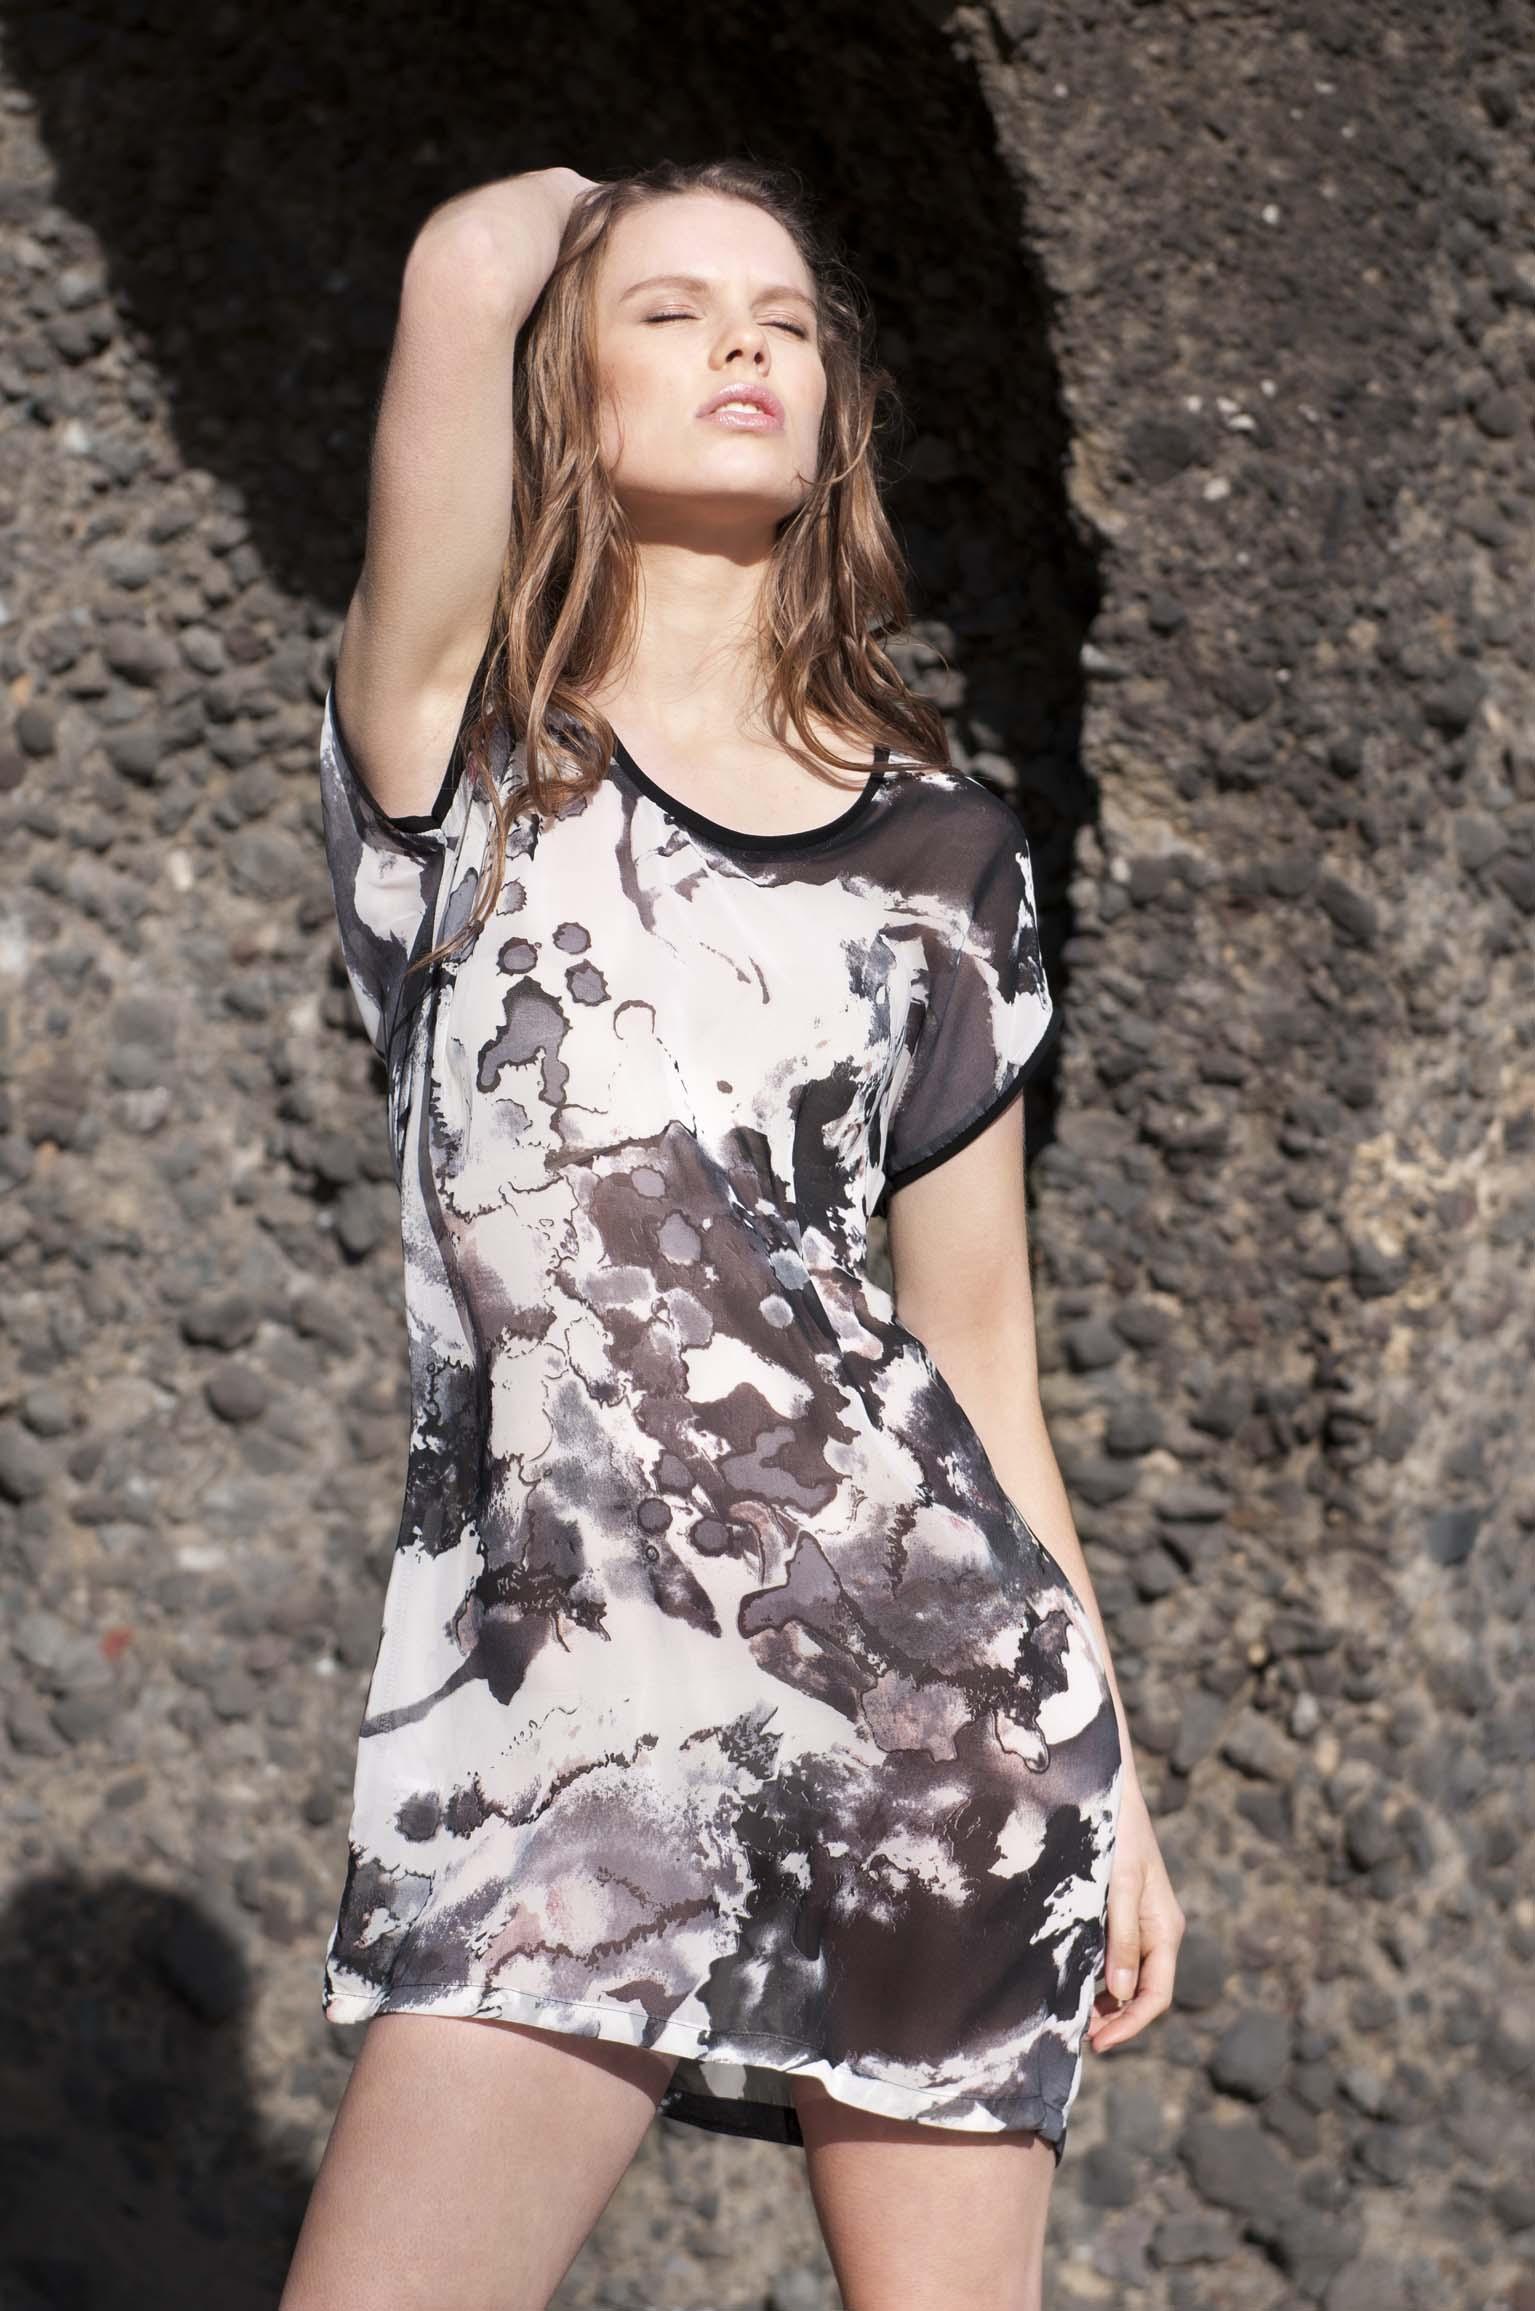 Clare from Nova model Agency, Auckland, NZ, wearing Ribbon on a Bombshell clothing. Fashion photoshoot in Whatipu beach, Waitekere range